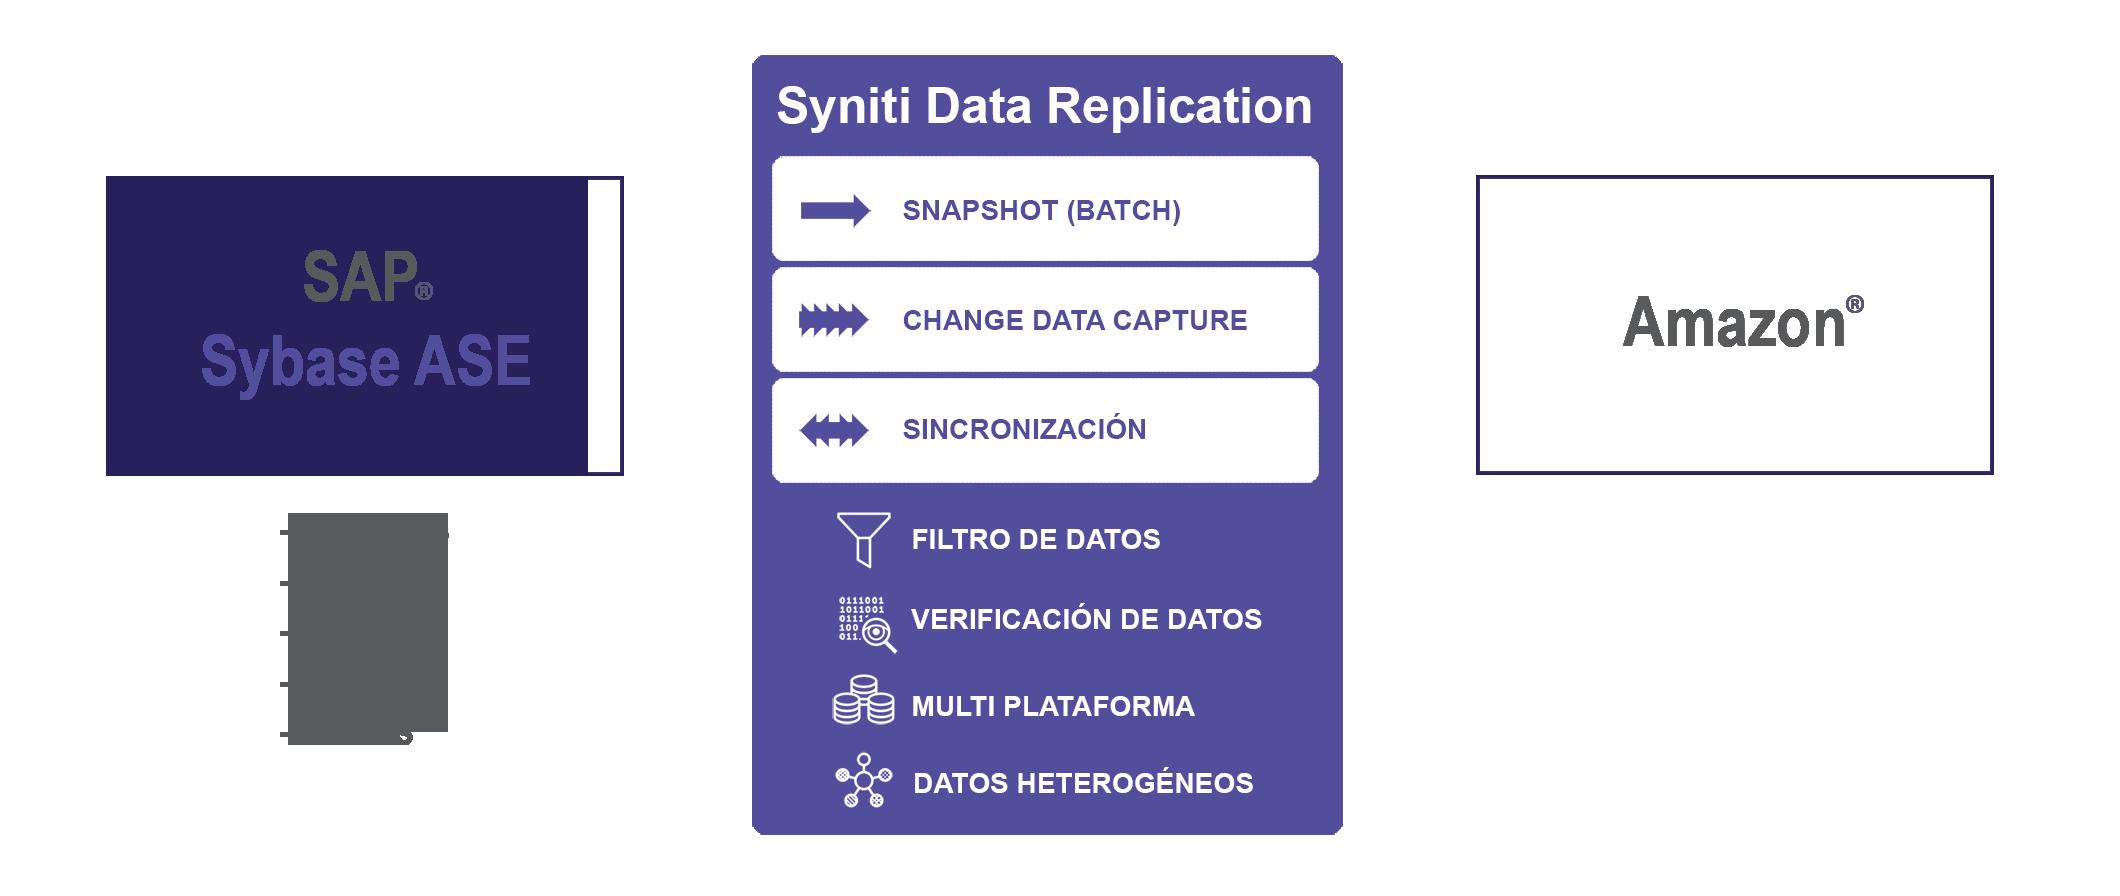 Replicación de datos Sybase ASE a Amazon en tiempo real